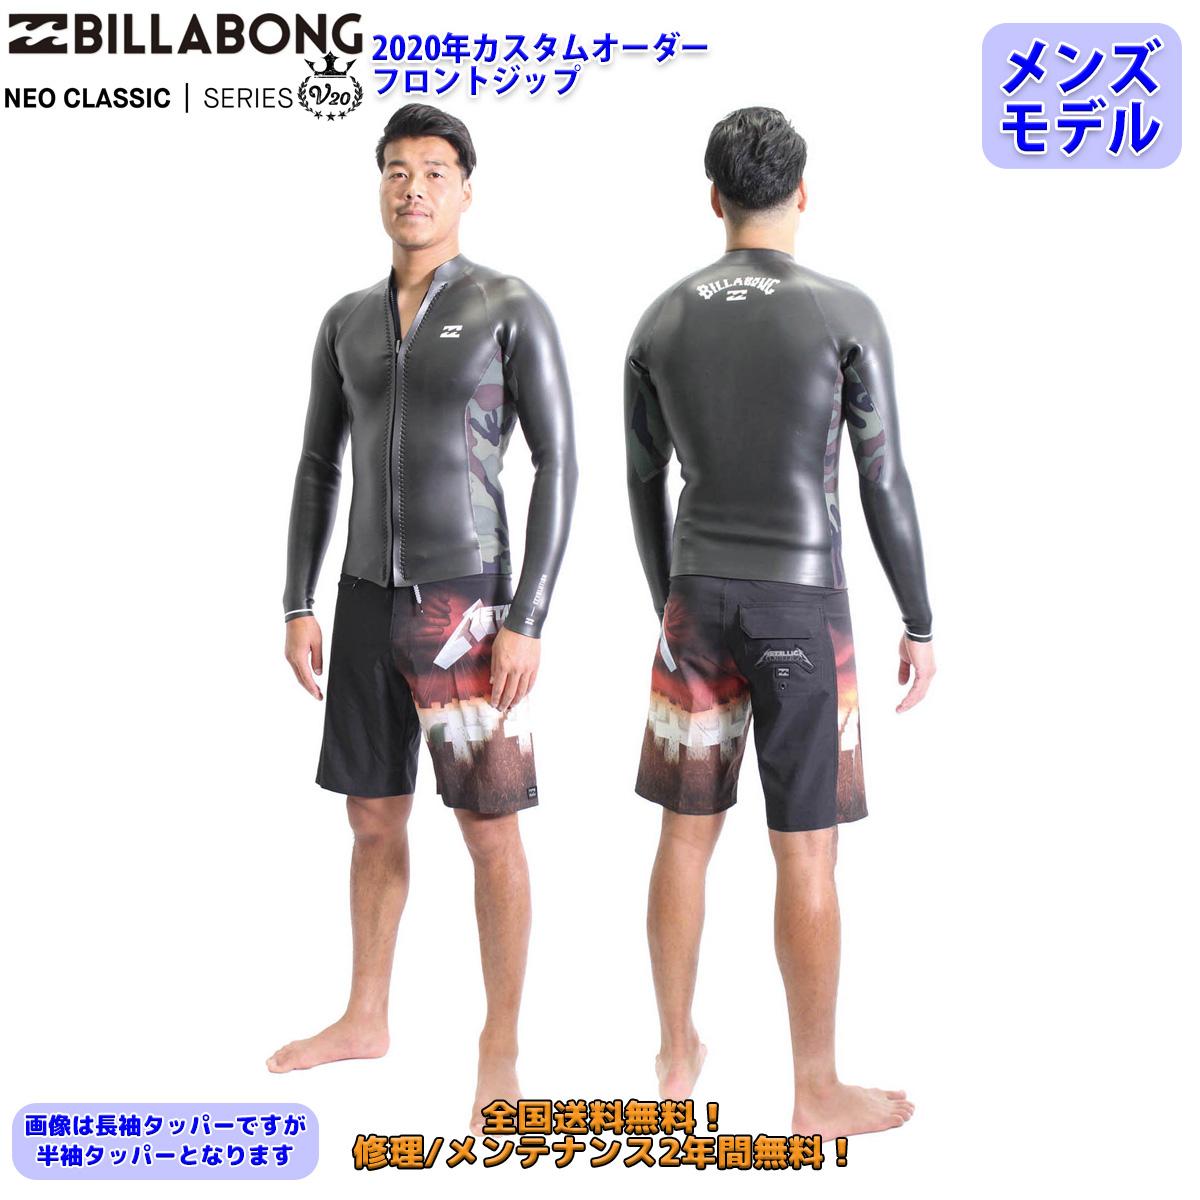 20 BILLABONG ビラボン 半袖タッパー フロントジップ ウェットスーツ ウエットスーツ カスタム オーダー 春夏用 メンズモデル 2020年 品番 BA018-522 日本正規品